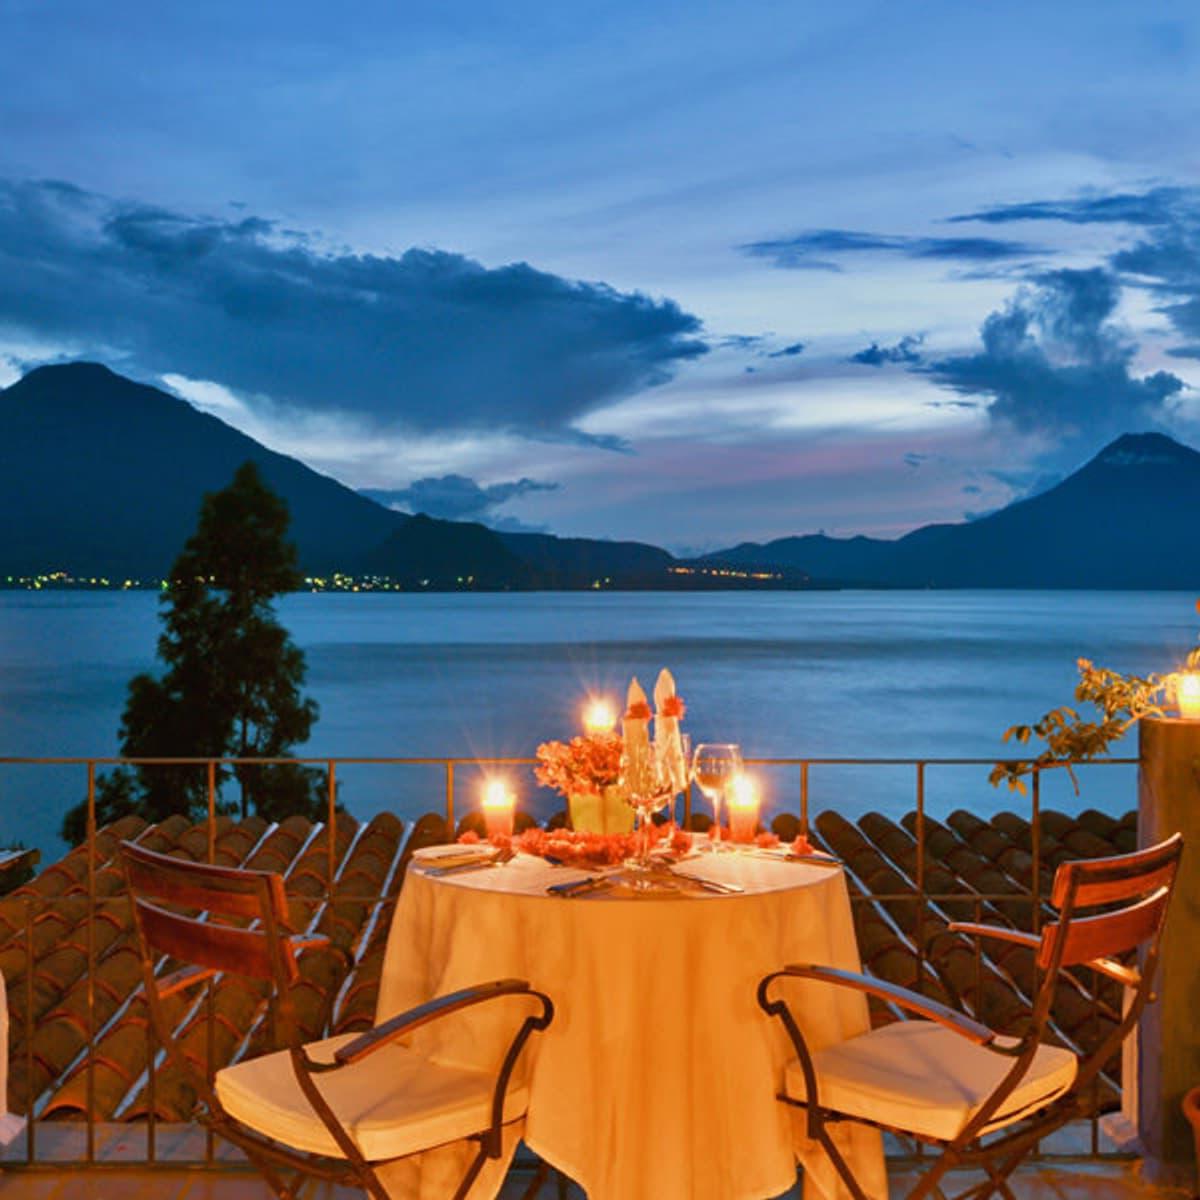 Lake Atitlan Candlelight Dinner prepared during custom Guatemala itinerary